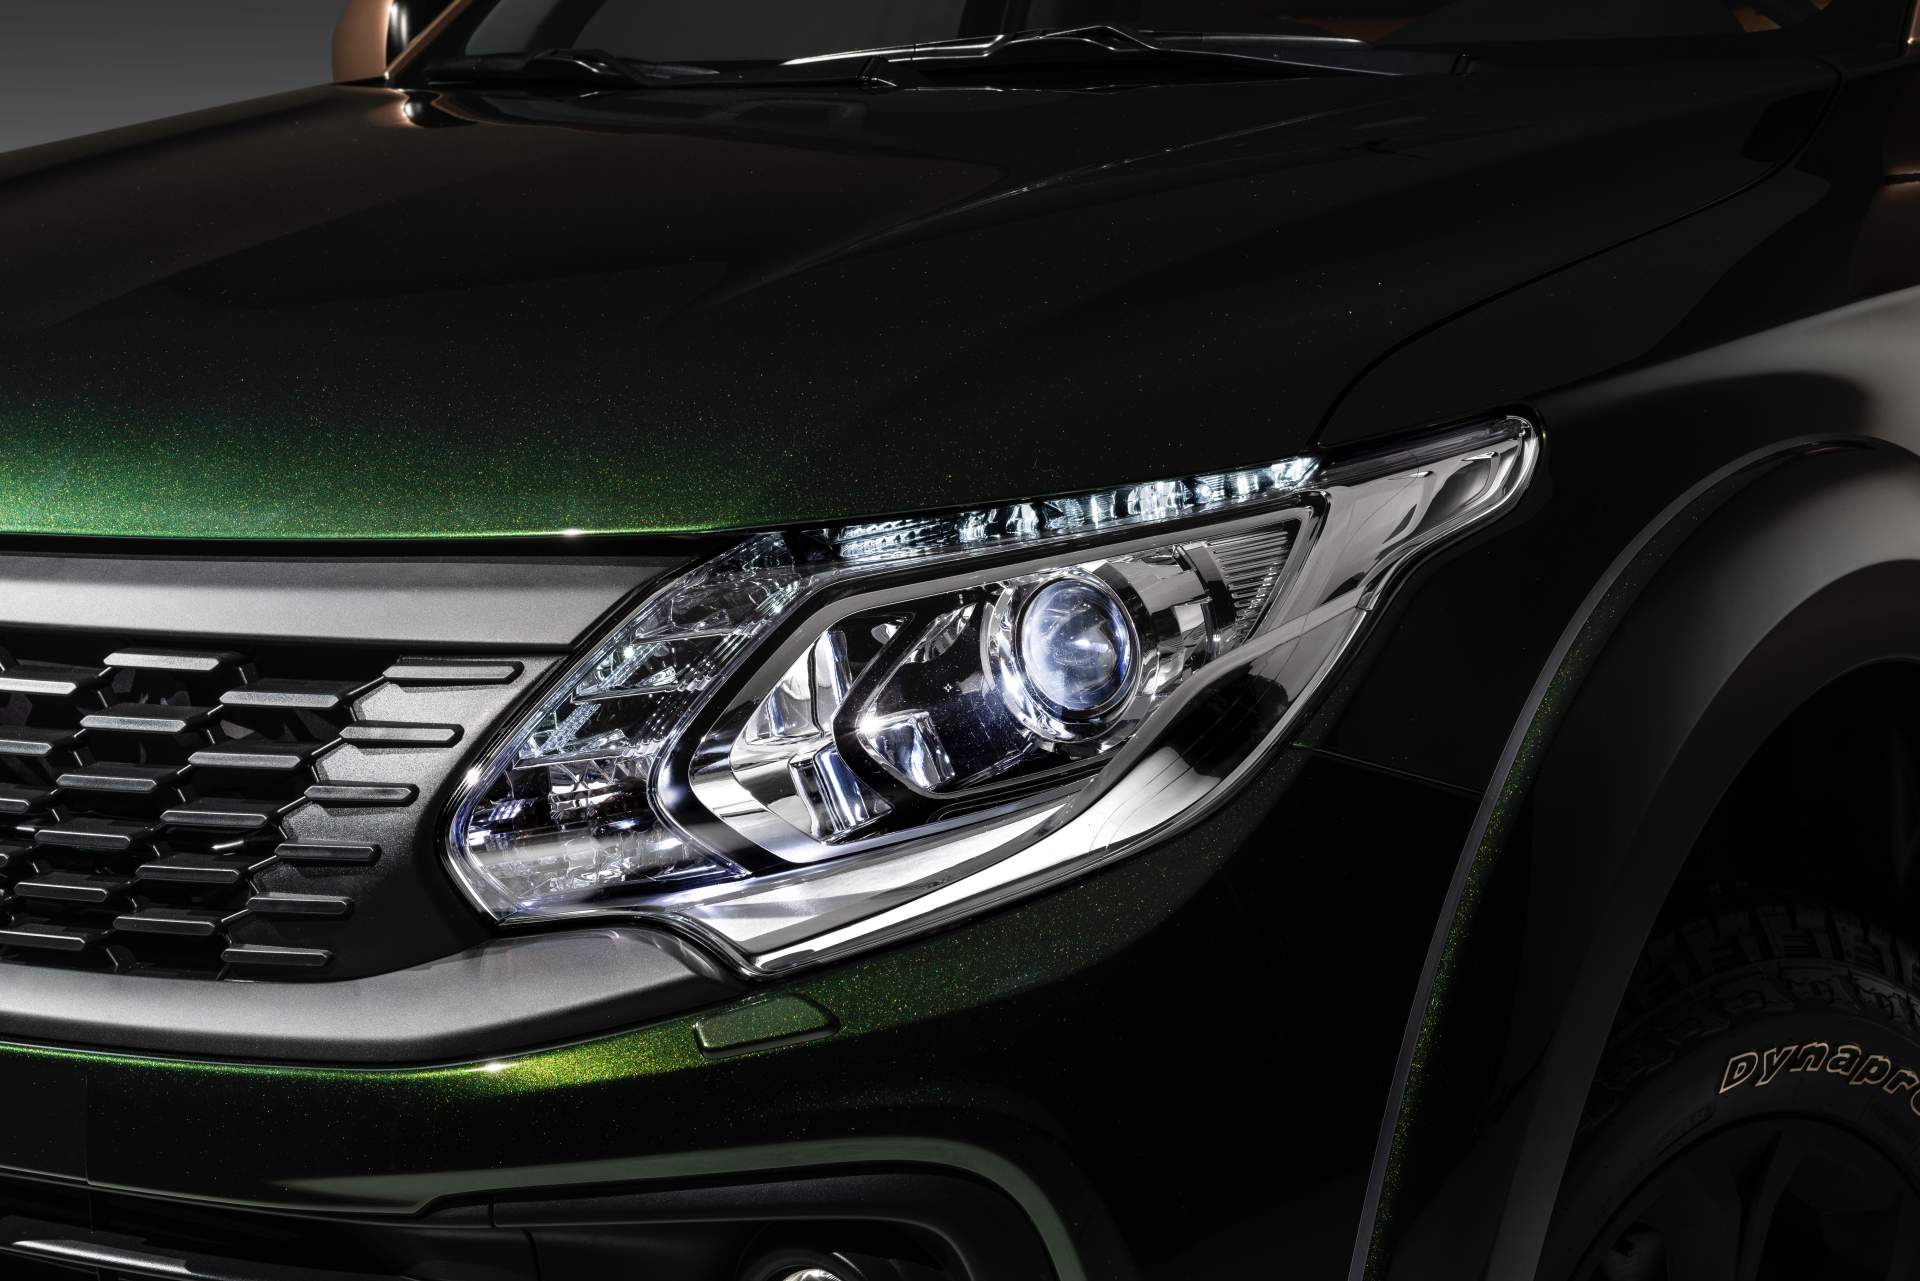 Fiat_Fullback_Cross_Concept_by_Garage_Italia_Customs_0003